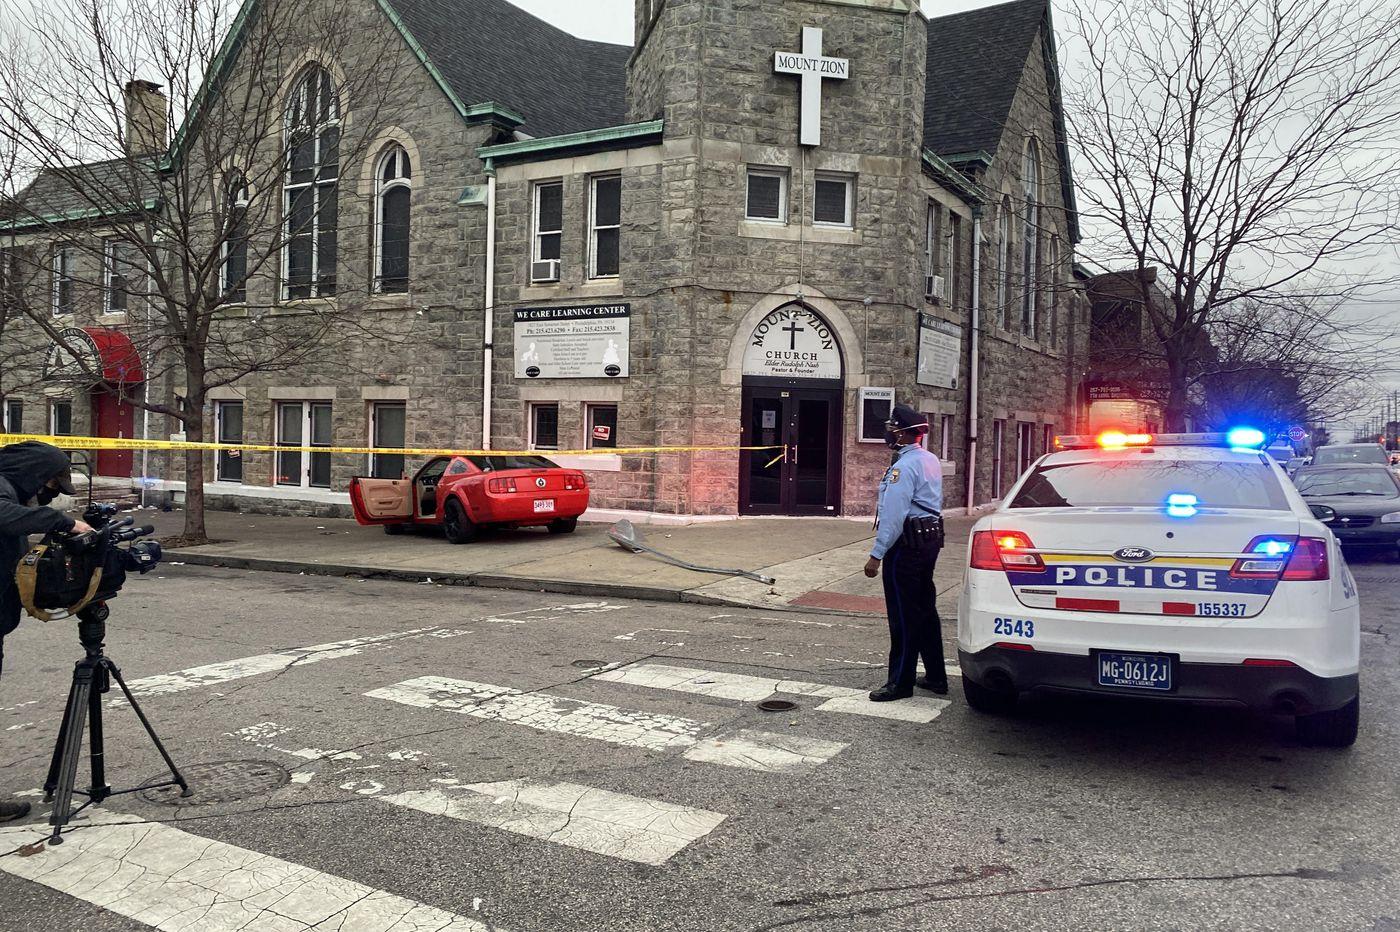 Philadelphia police: Officer fatally shot a Kensington man who shot at him first